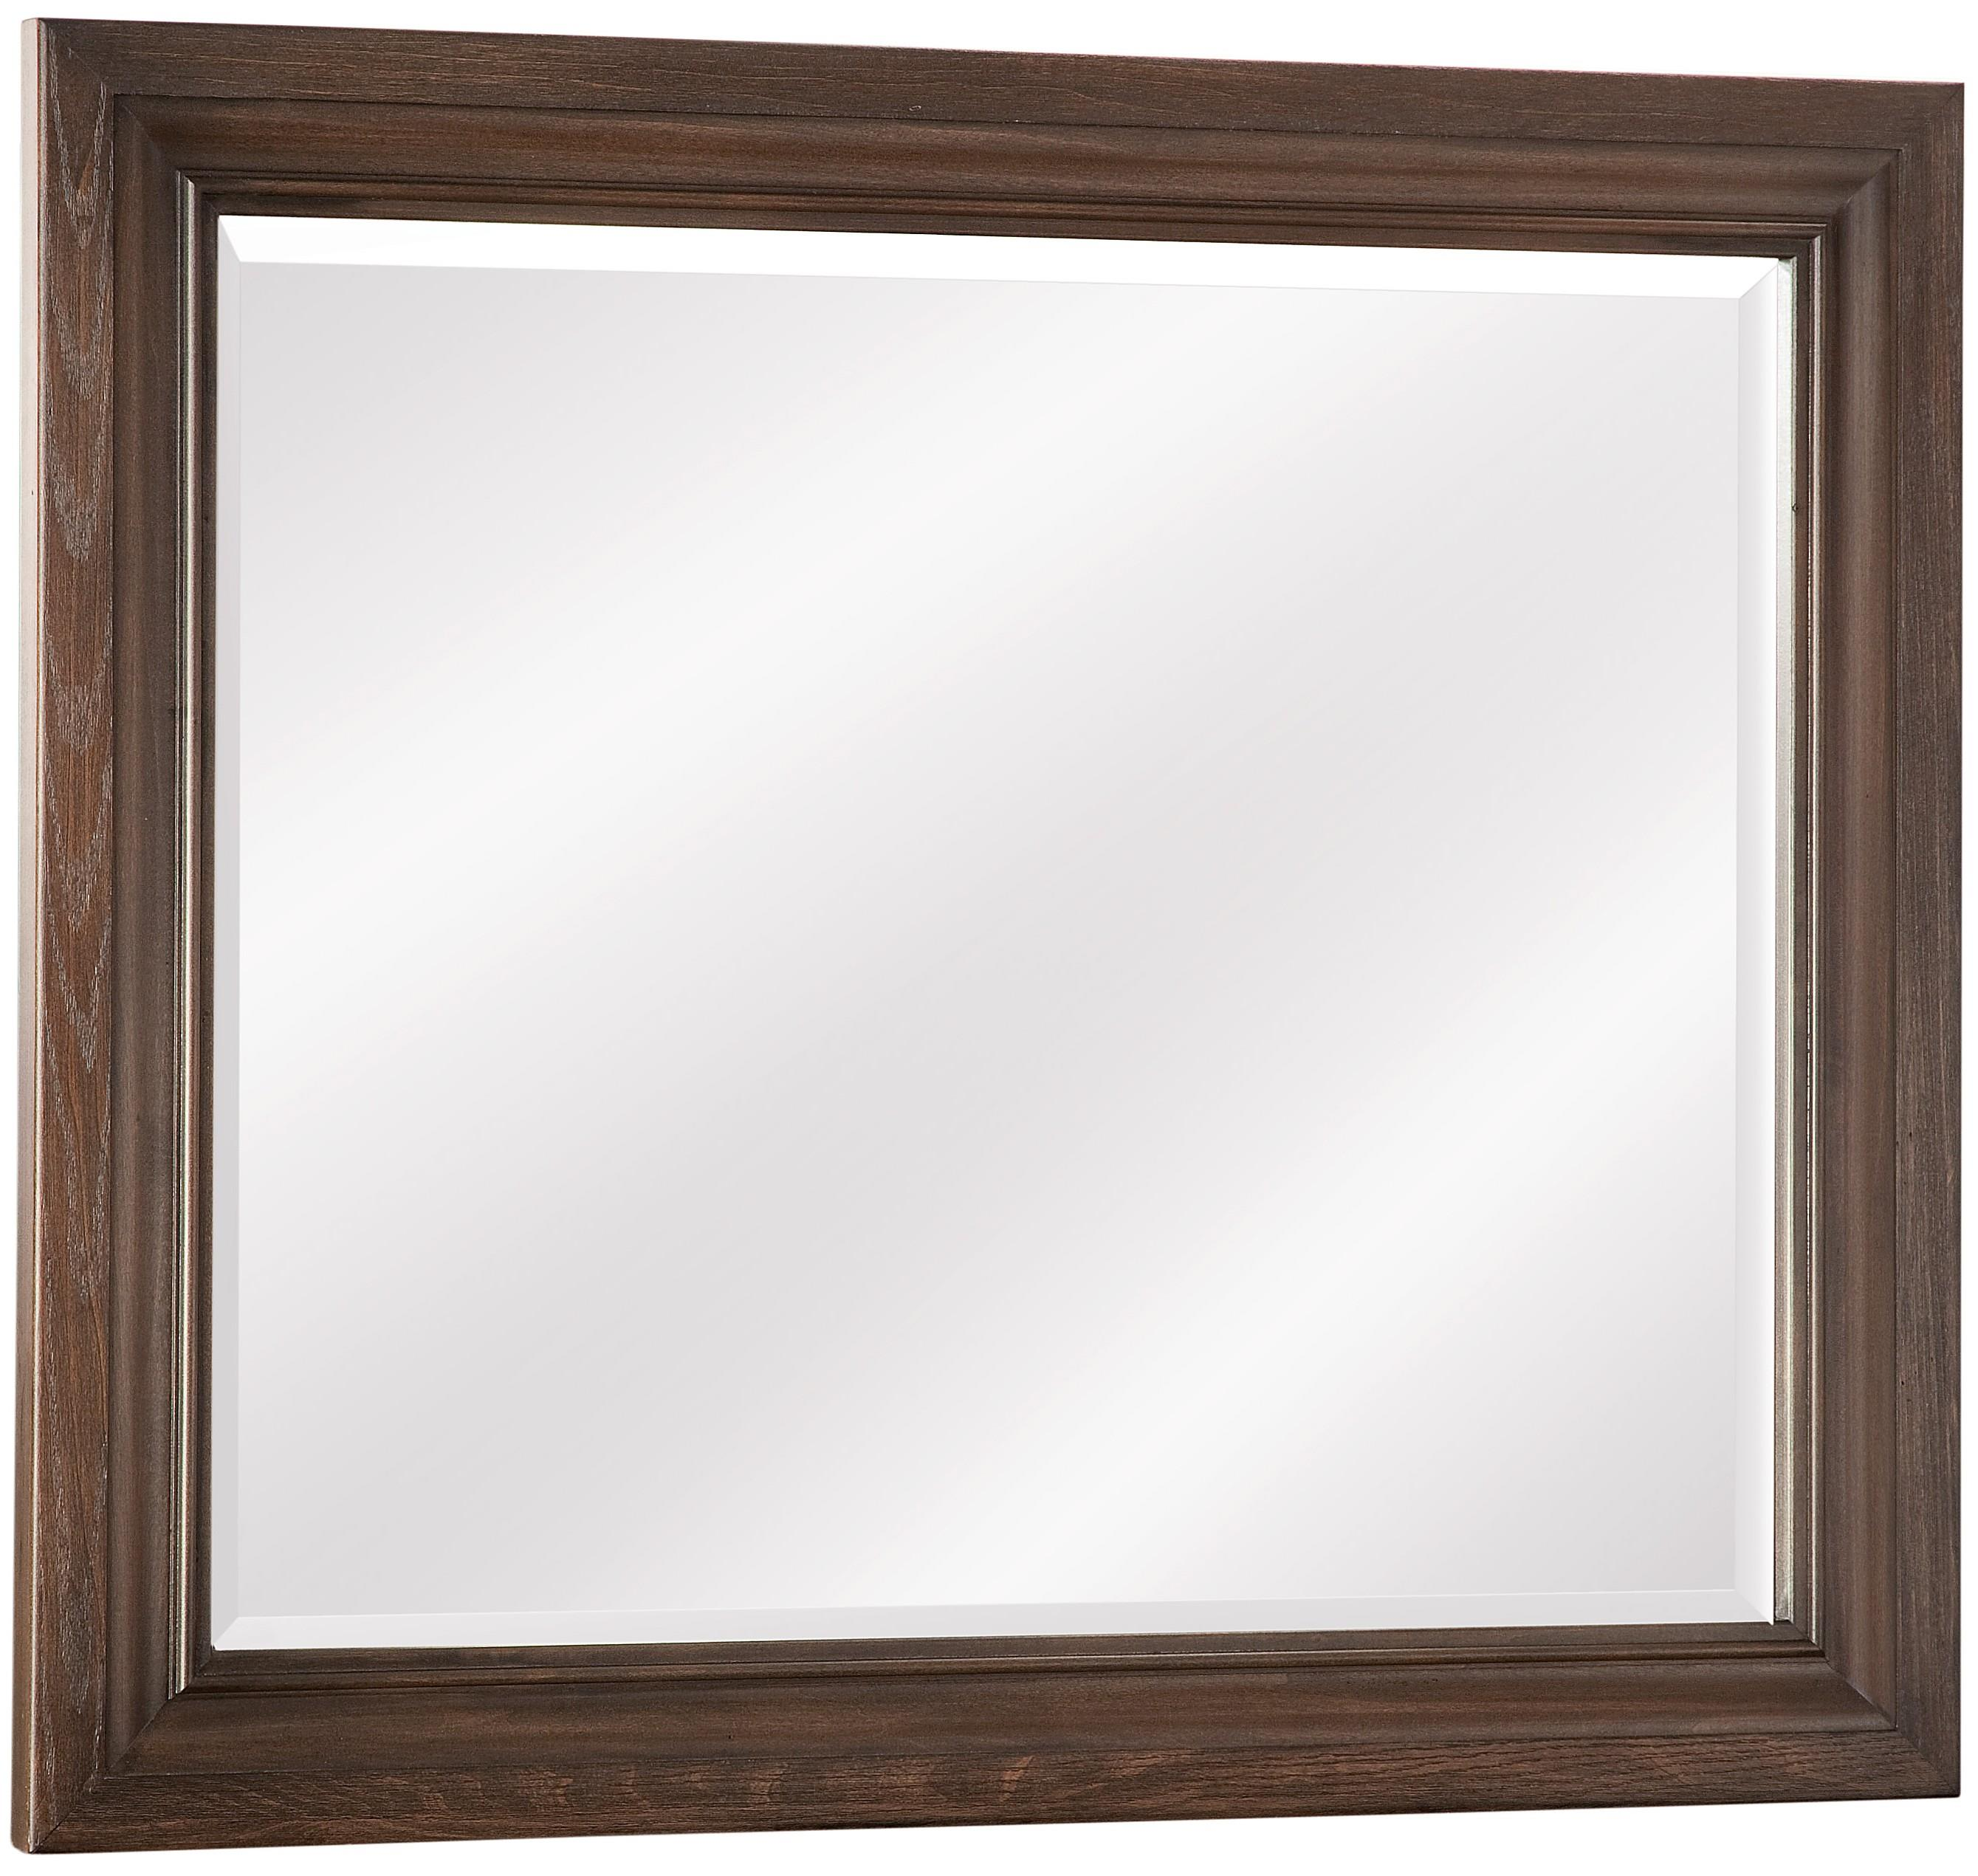 Vaughan Bassett Whiskey Barrel Landscape Mirror - Item Number: 816-446